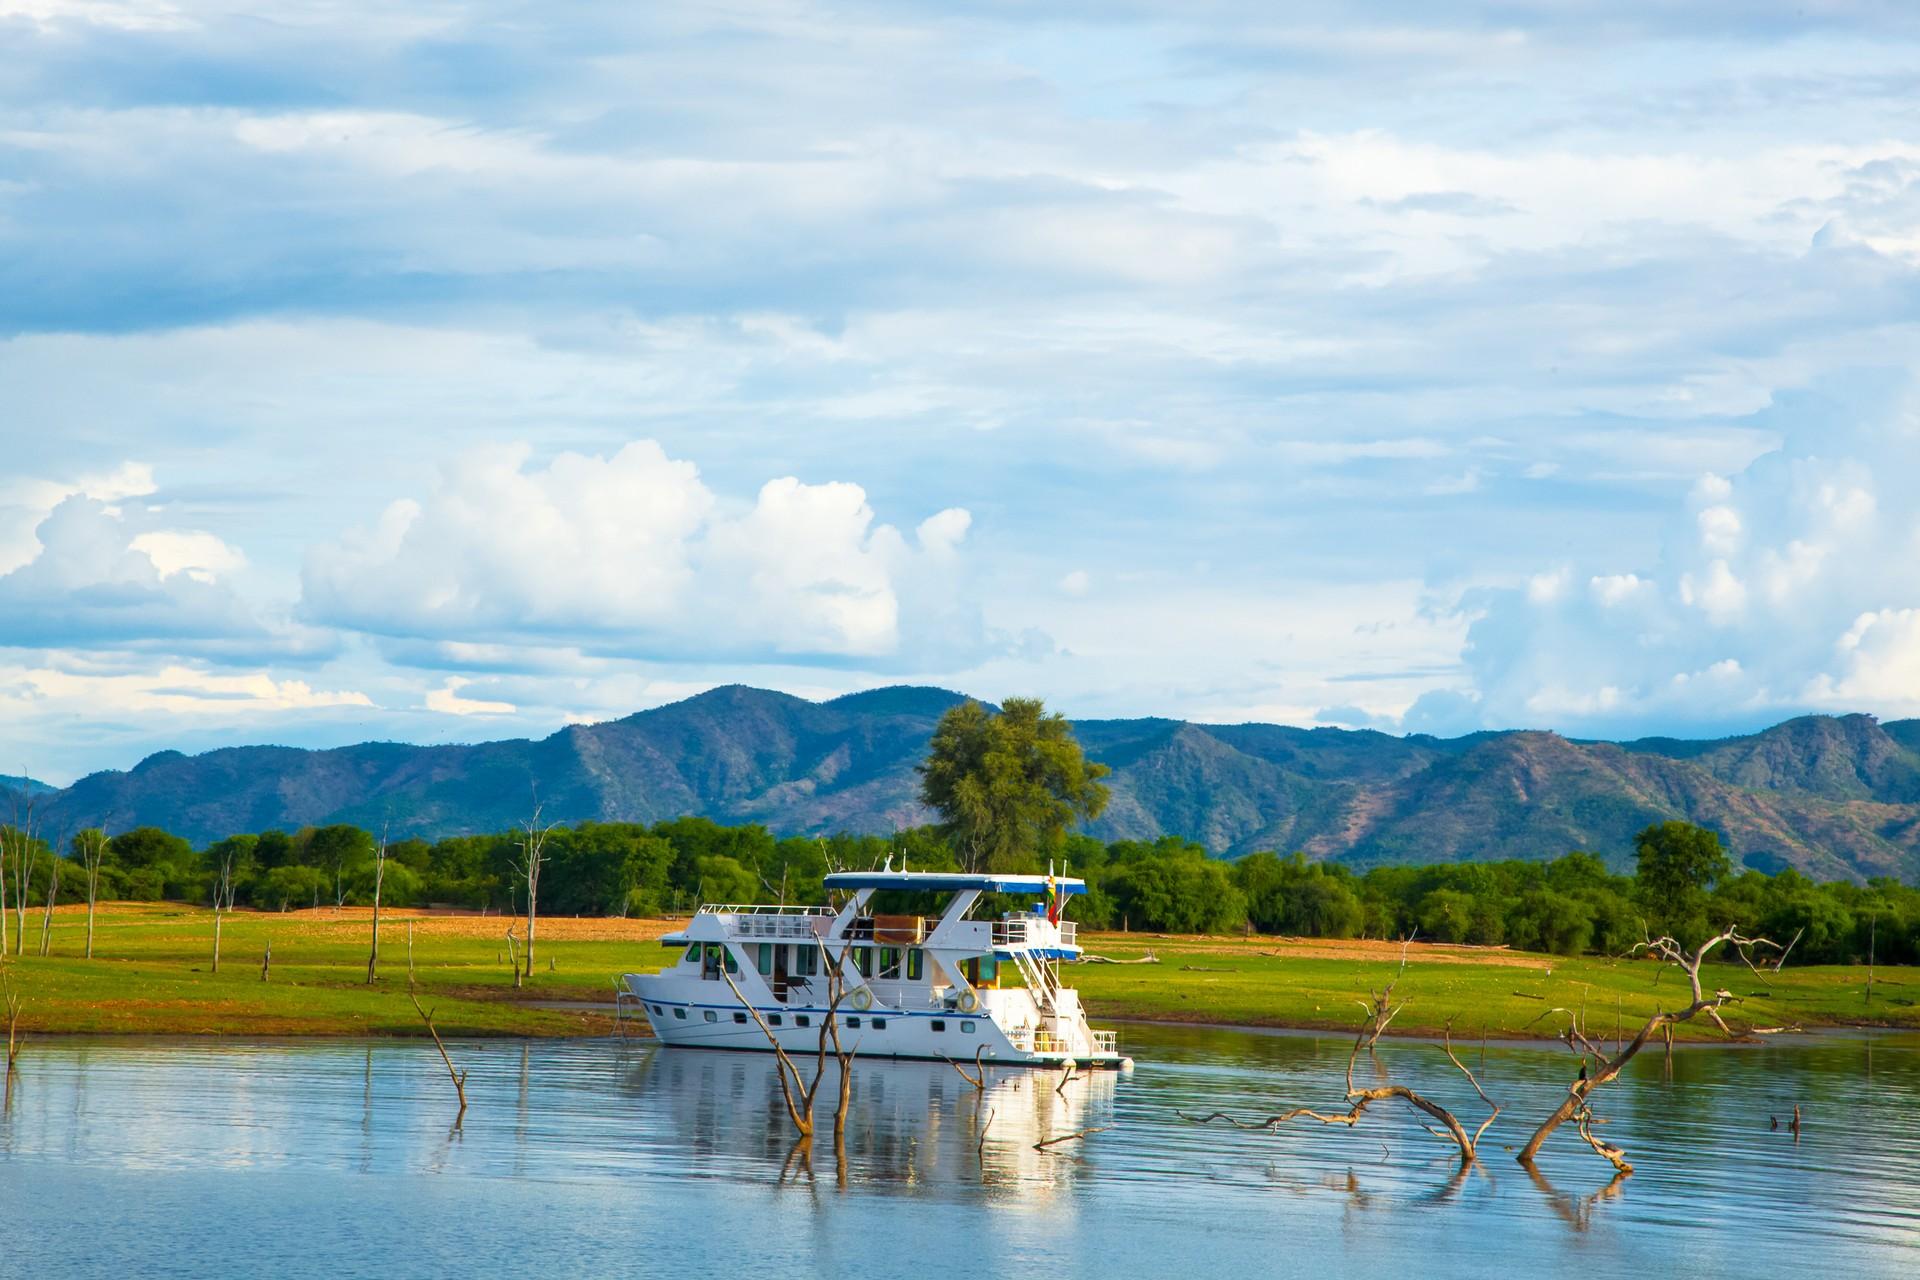 Zimbabwe's best natural attractions: Lake Kariba